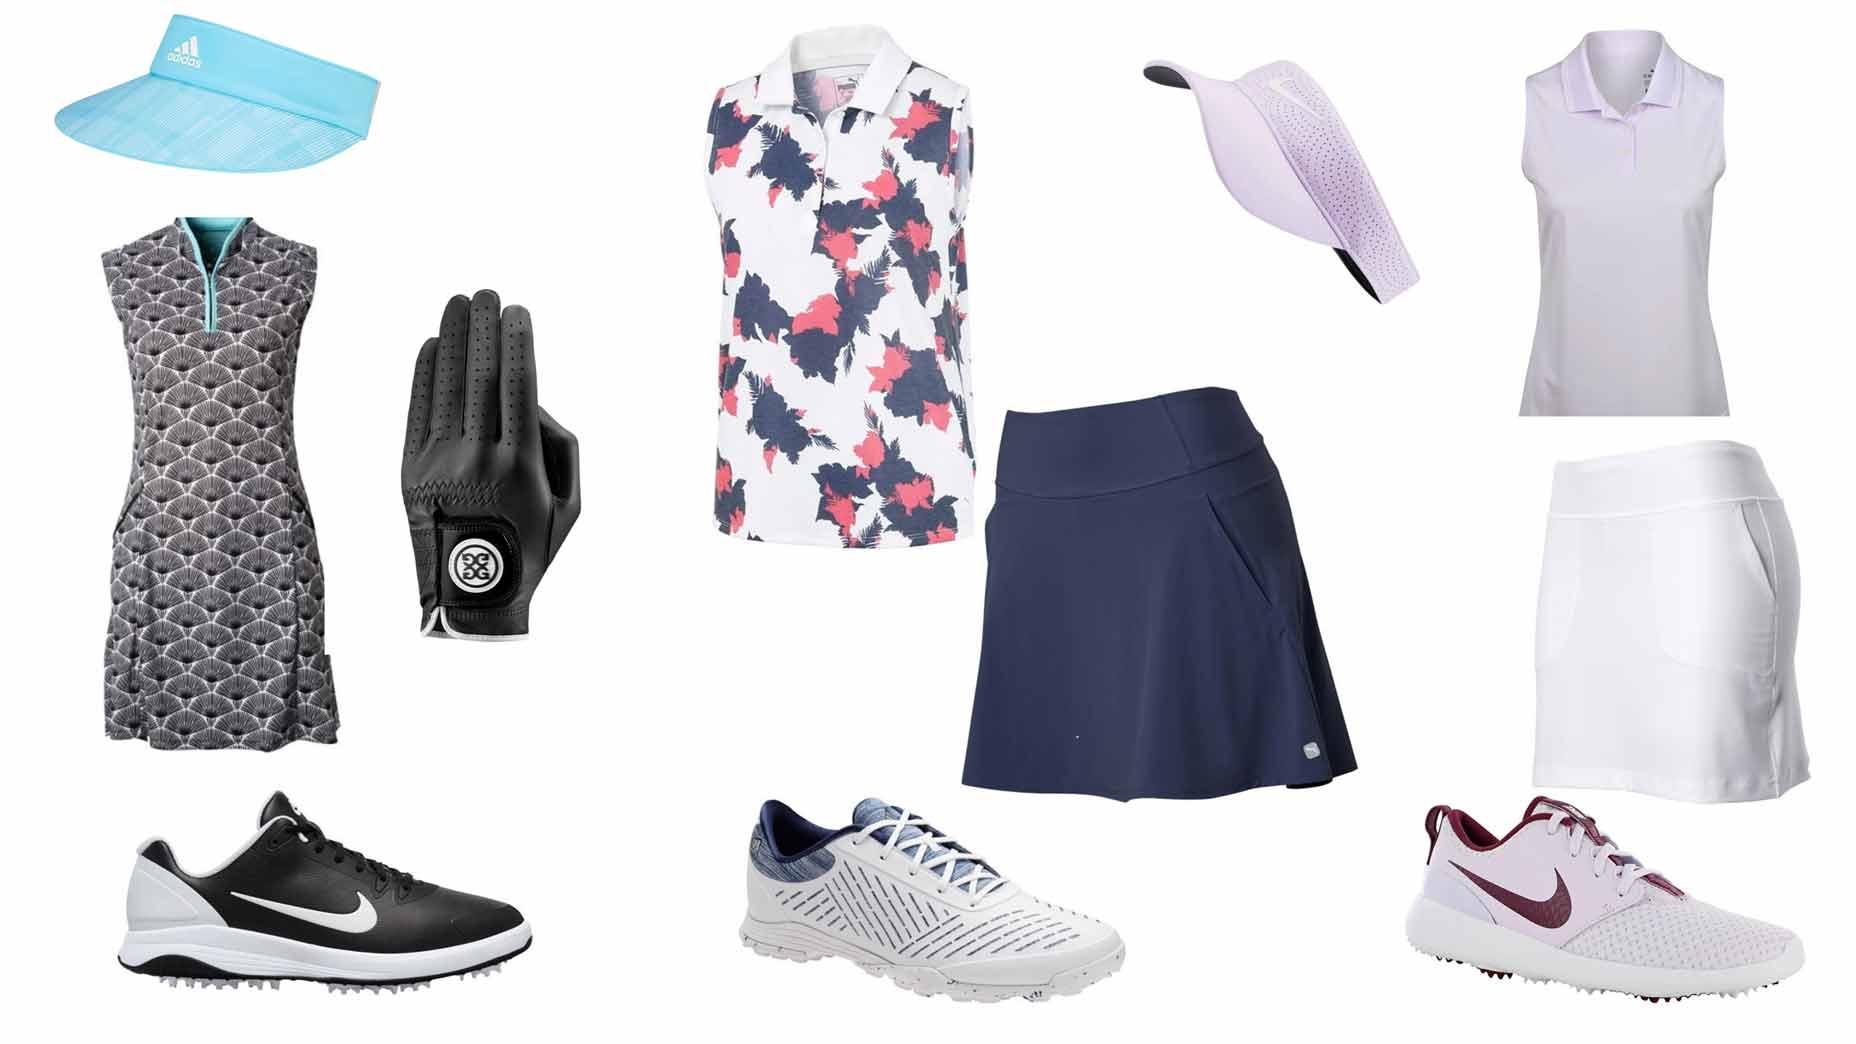 women's golf outfits